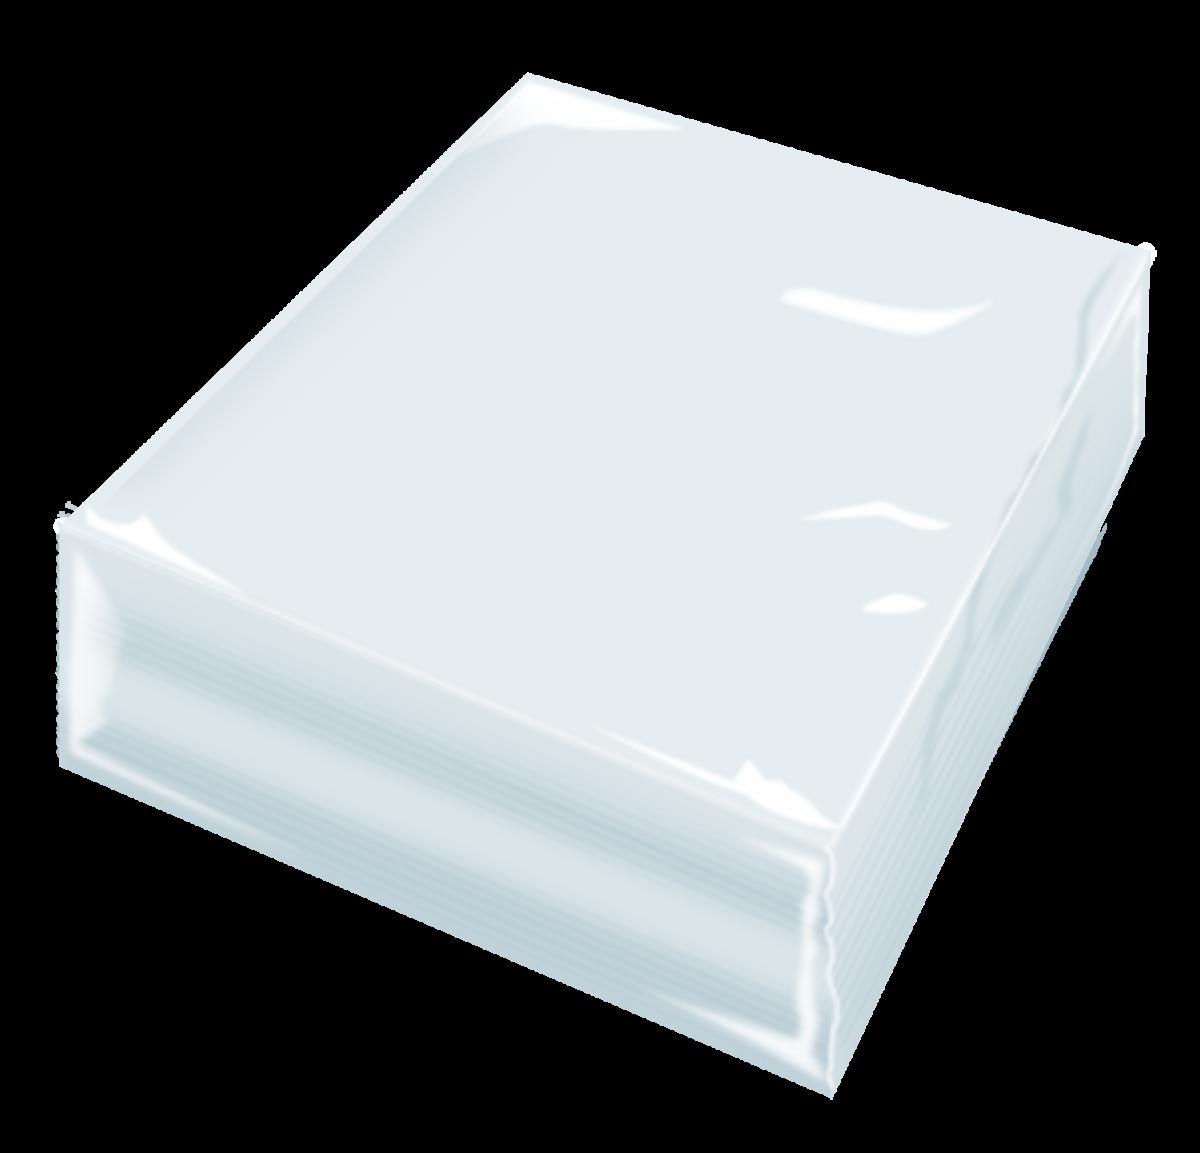 Вакуумний пакет PRO serivce 250*300мм, 60 мкм- Фото - Biosphere